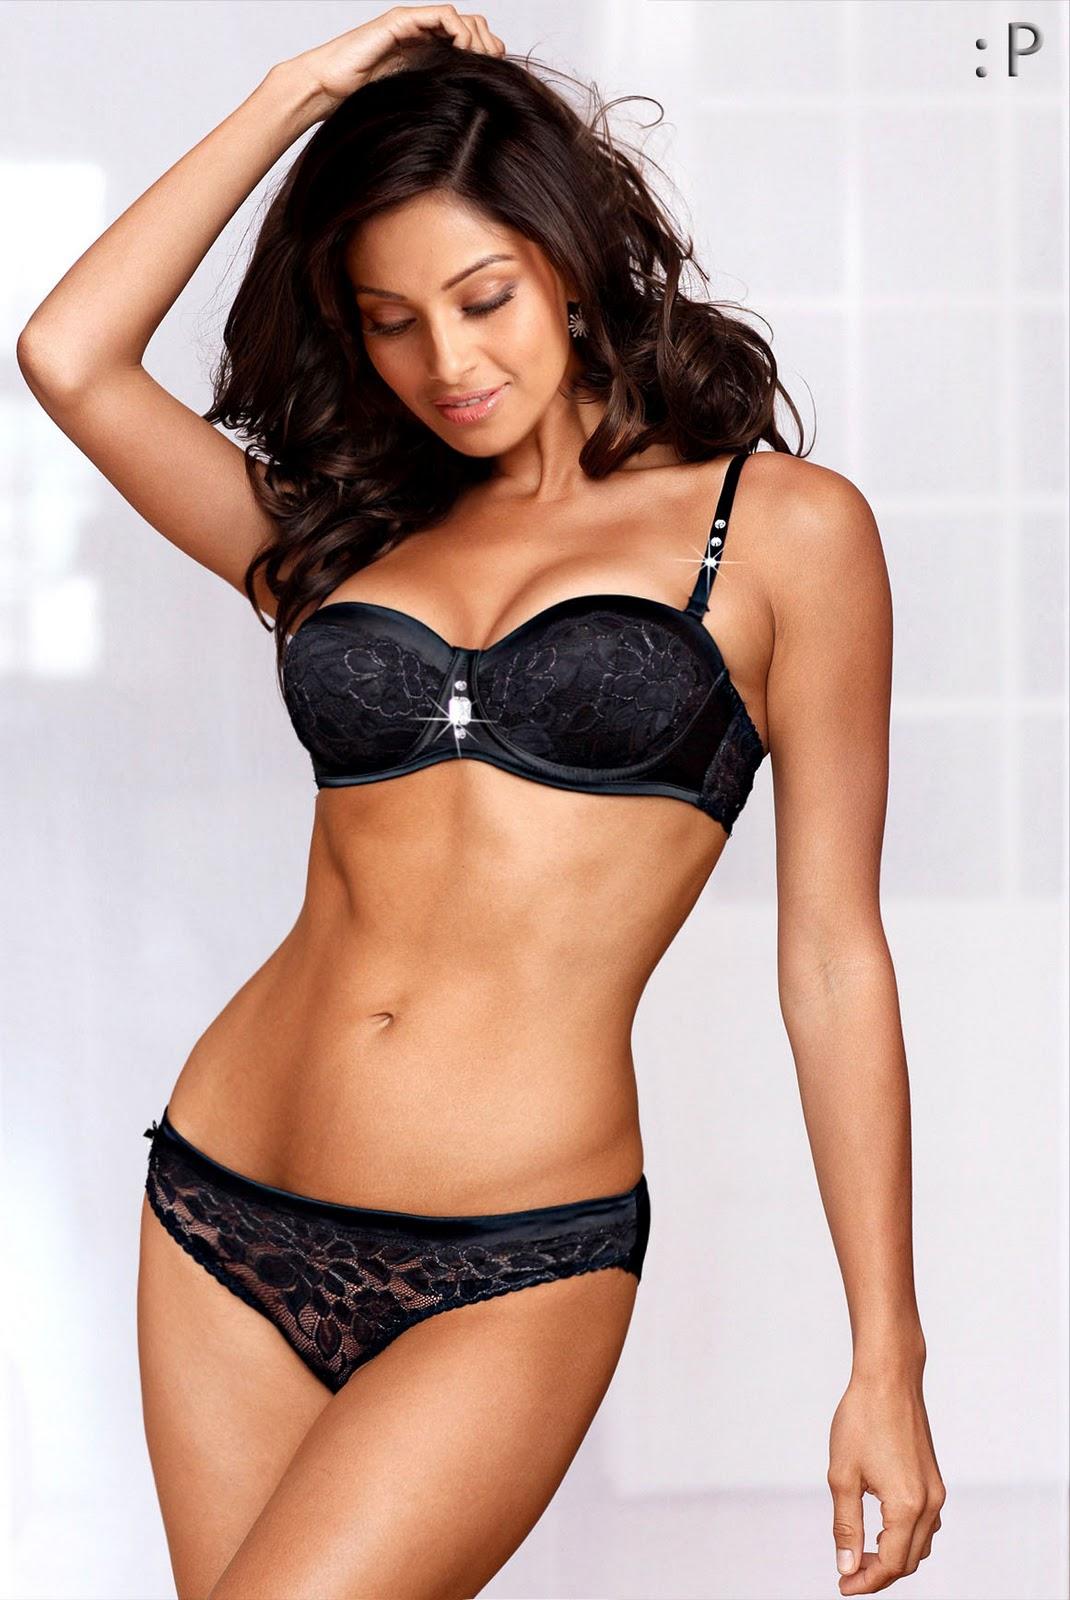 Sexy images kat-1239